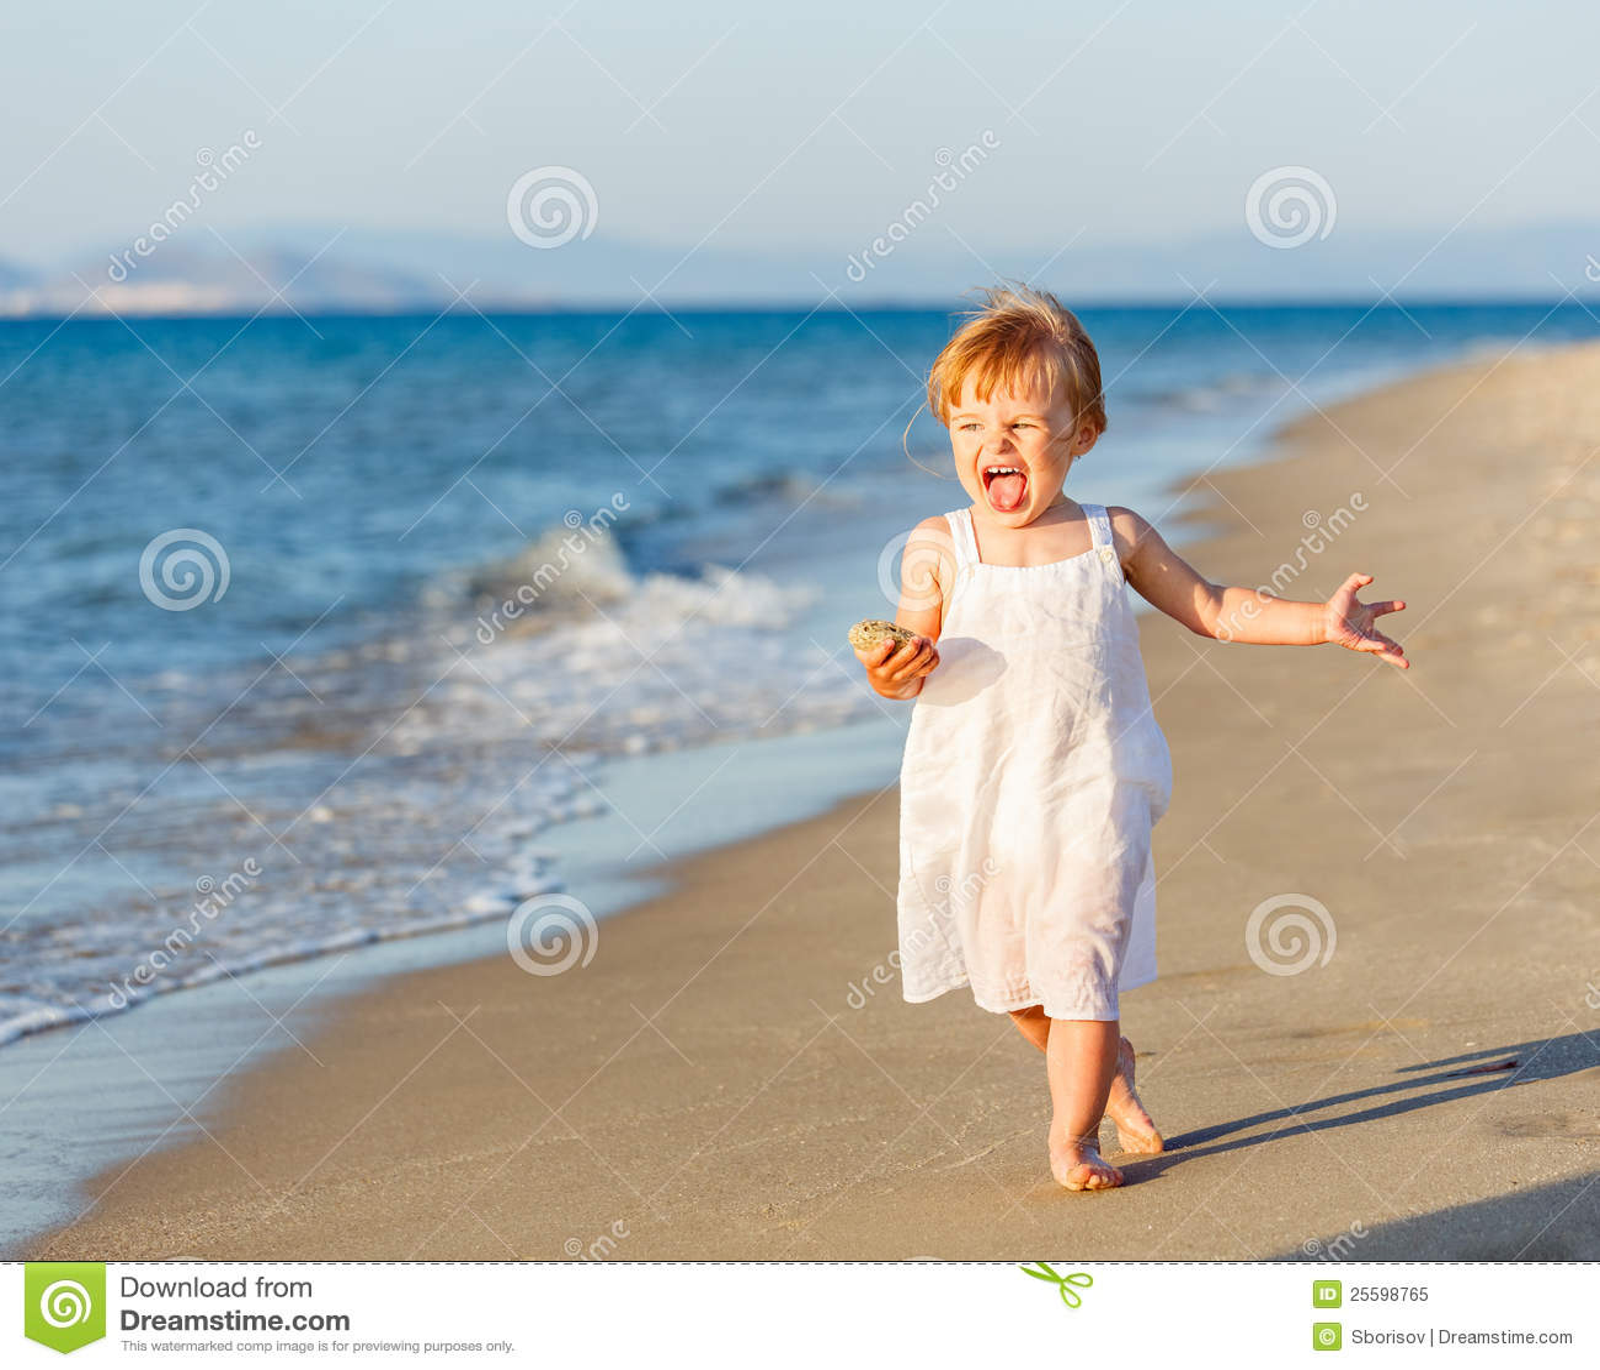 Little Girl Running On The Beach Royalty Free Stock Photo ... Girl Running On Beach